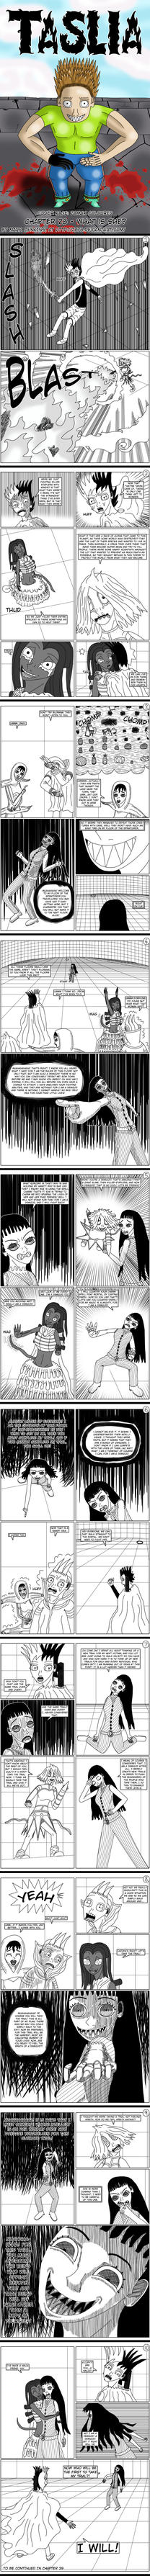 Taslia comic - Chapter 28, by ZXY8 by zxy8